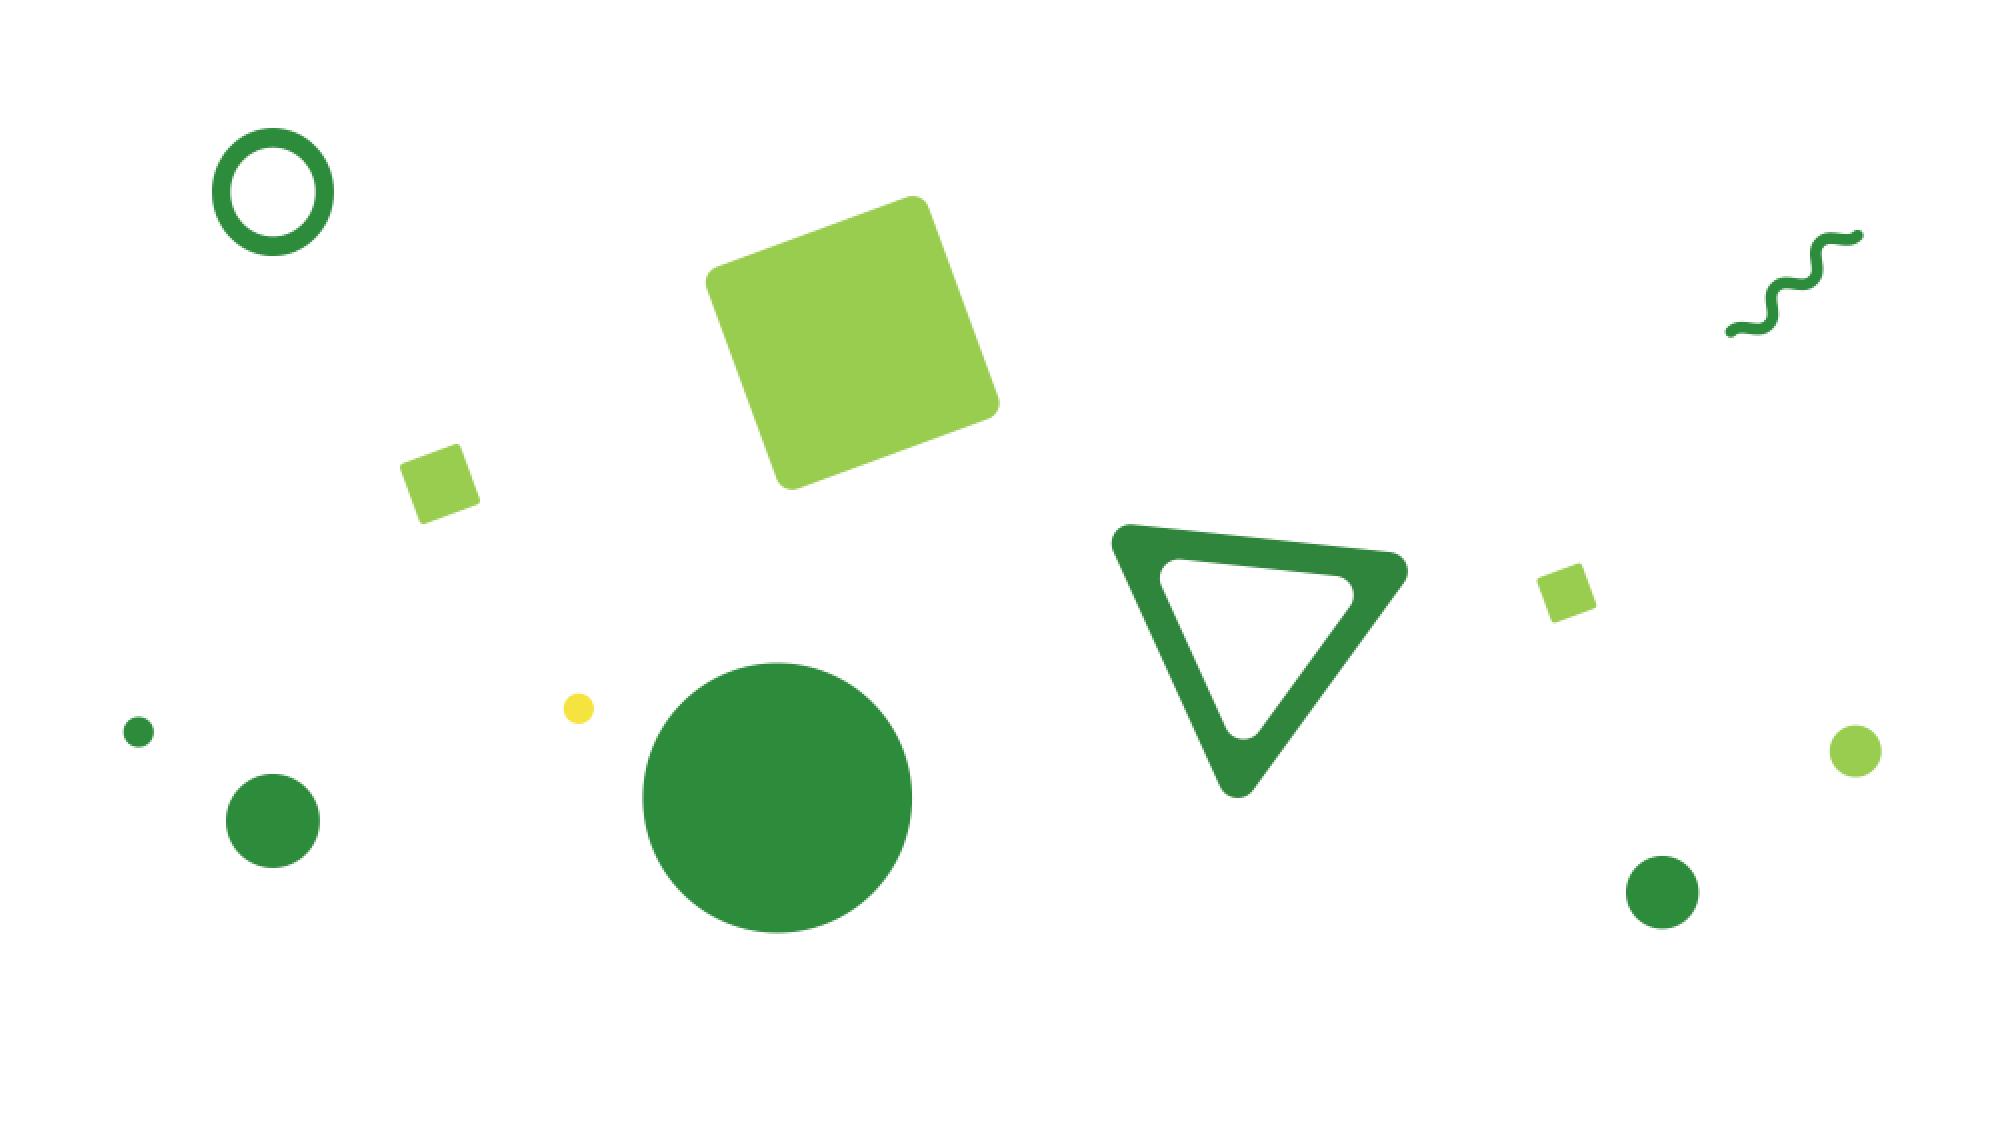 Spindleで定義されている抽象的な緑色の四角形、三角形、丸や波線などのイラスト図形が浮かぶイメージ図